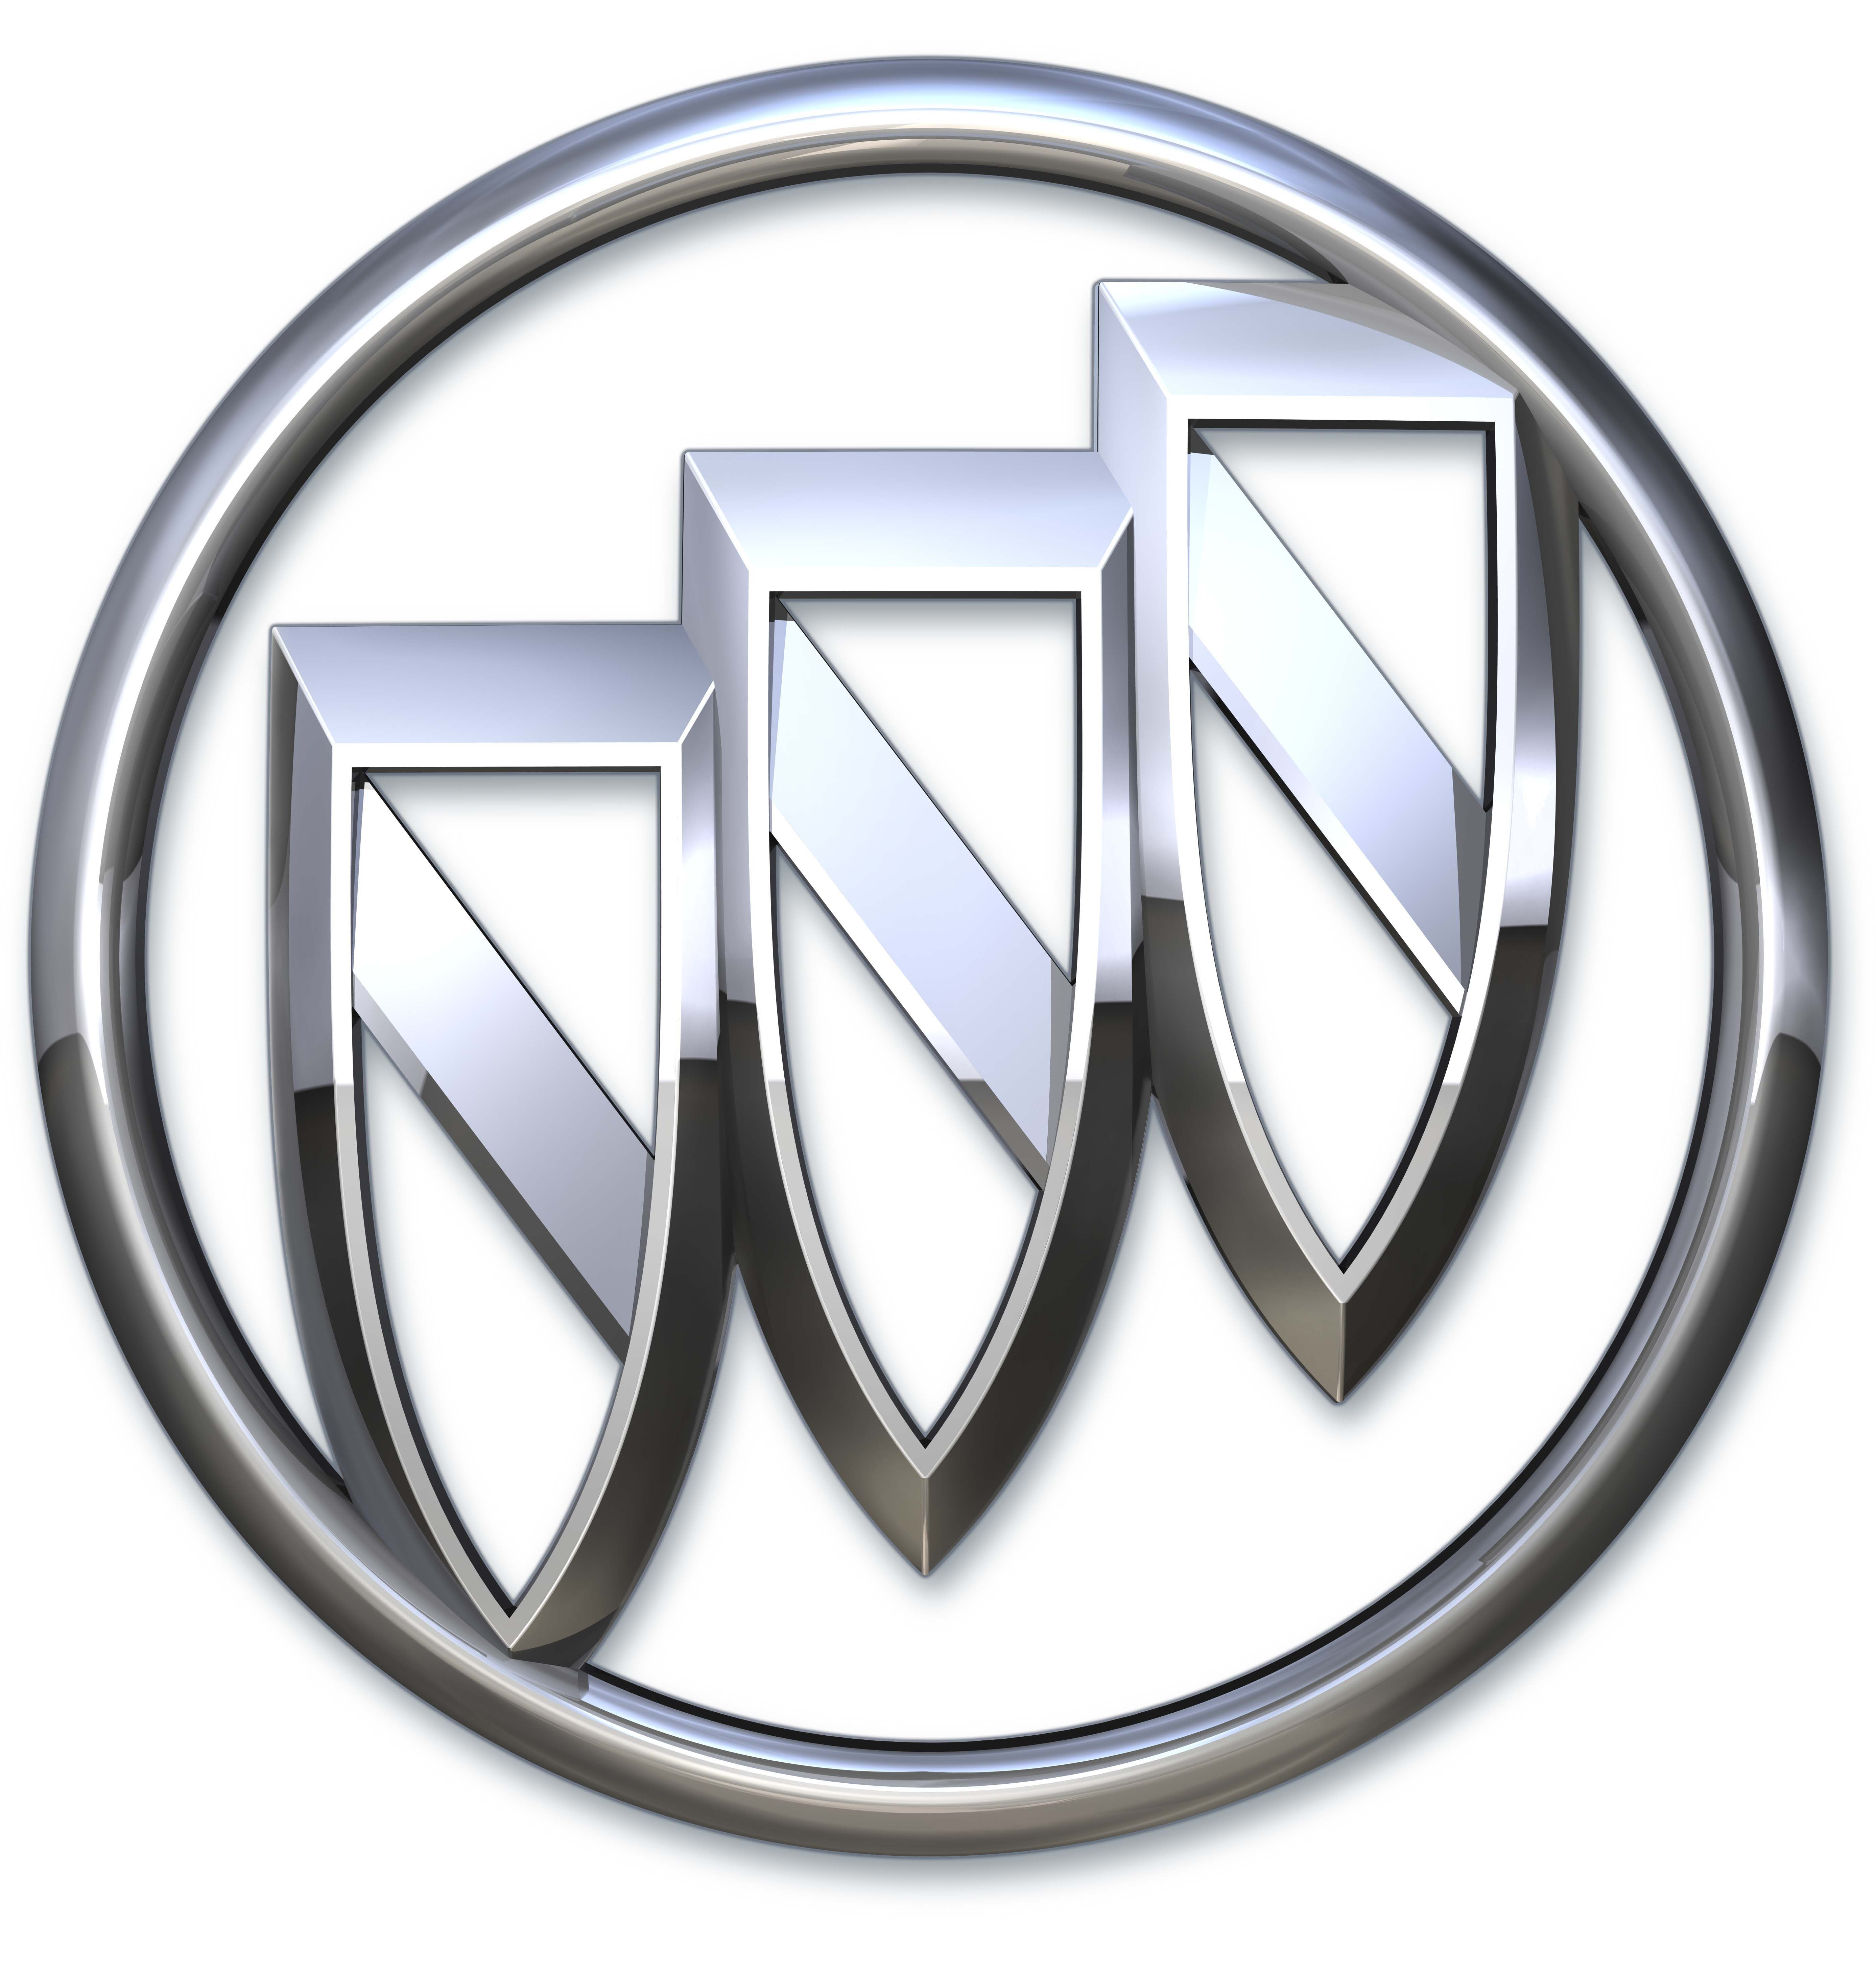 Buick dealership dickson tn used cars alexander chevrolet buick gmc dealer logos pinterest buick gmc buick and chevrolet